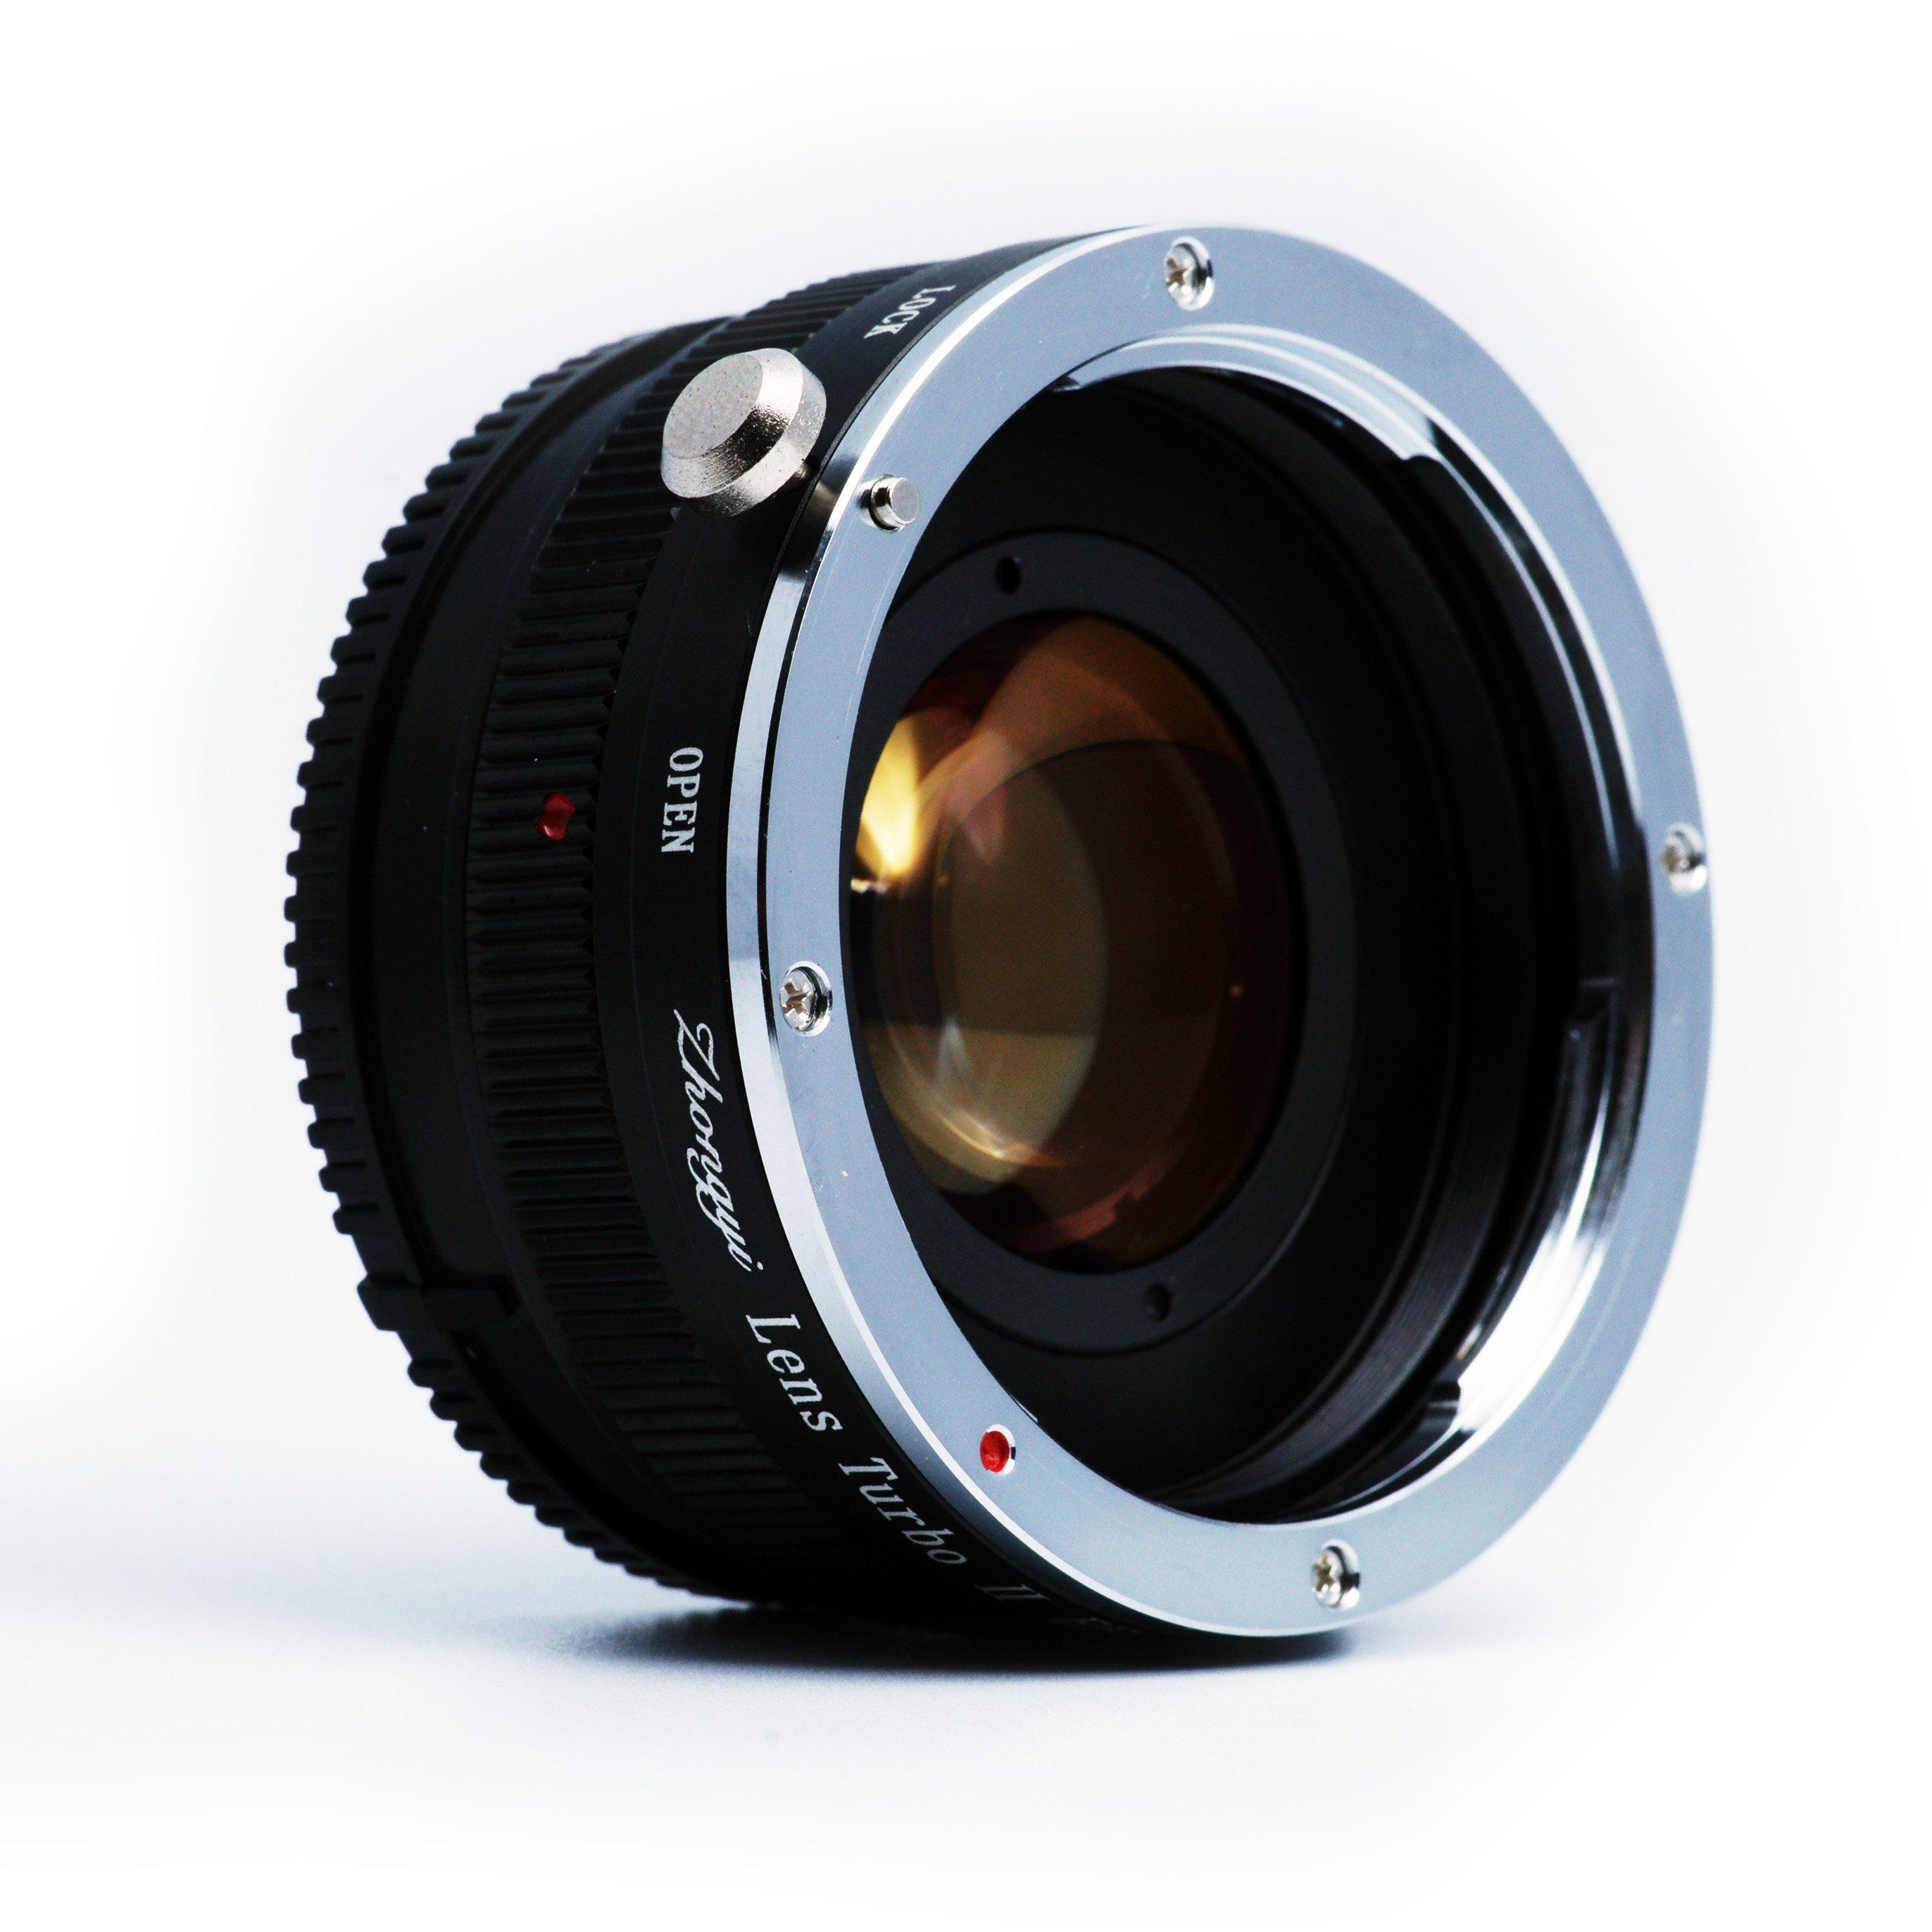 MITAKON adaptér objektivu Nikon na tělo Sony NEX Lens Turbo